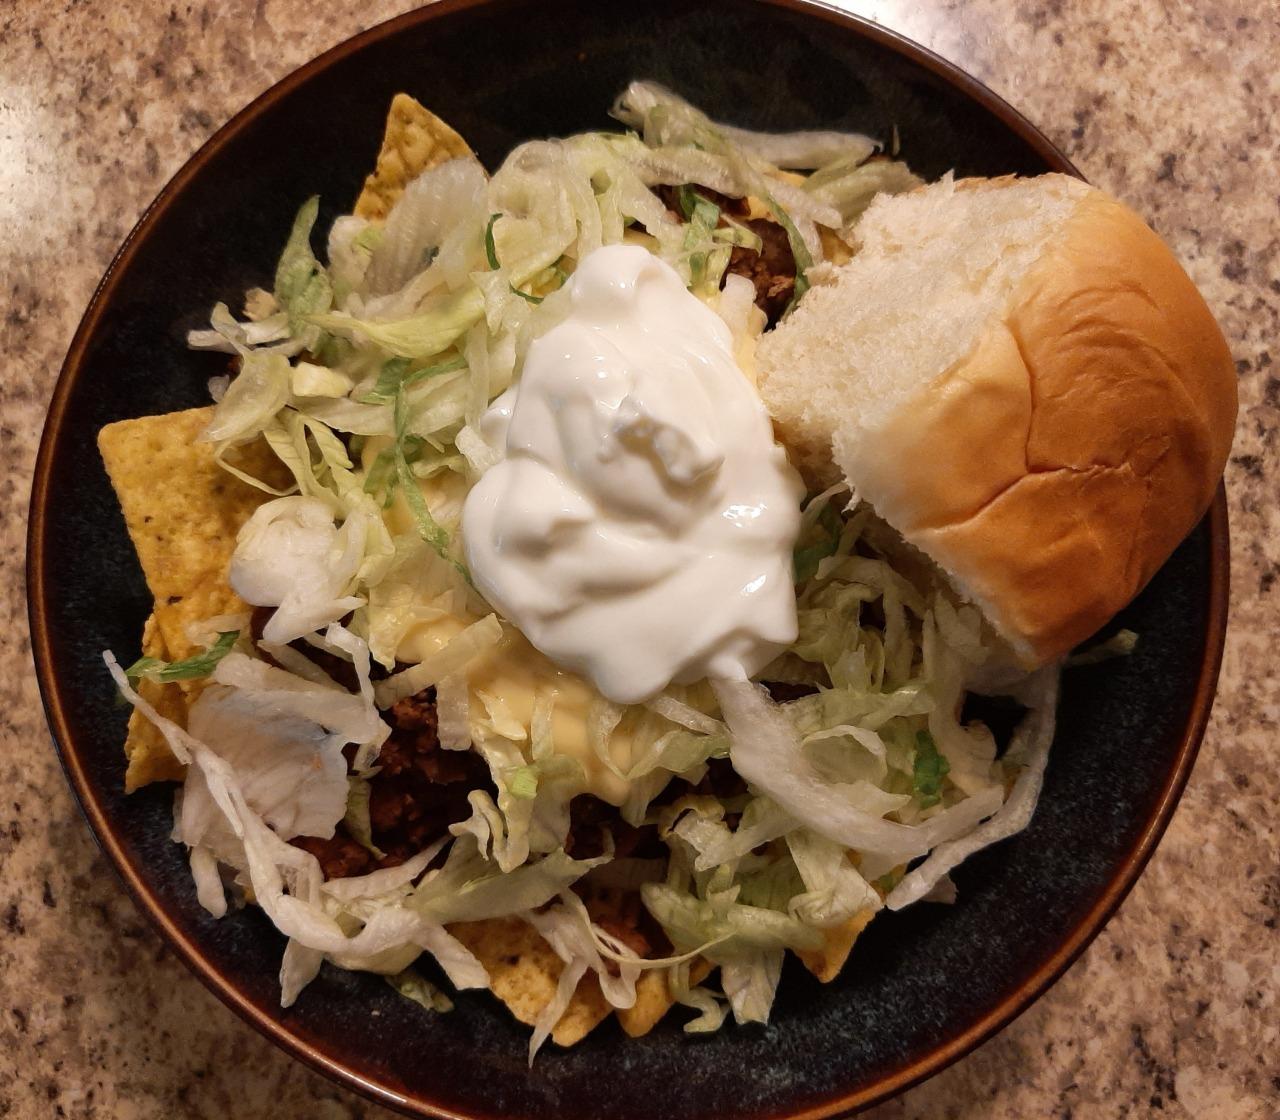 Nachos with taco-seasoned veggie meat, nacho cheese, shredded lettuce, sour cream, & a Hawaiian sweet roll #food#nachos#tortilla chips#veggie meat#quorn#taco seasoning#nacho cheese#cheddar#cheese#jalapeno#lettuce#sour cream#roll #hawaiian sweet roll #june#2021#june 2021#summer#vegetarian